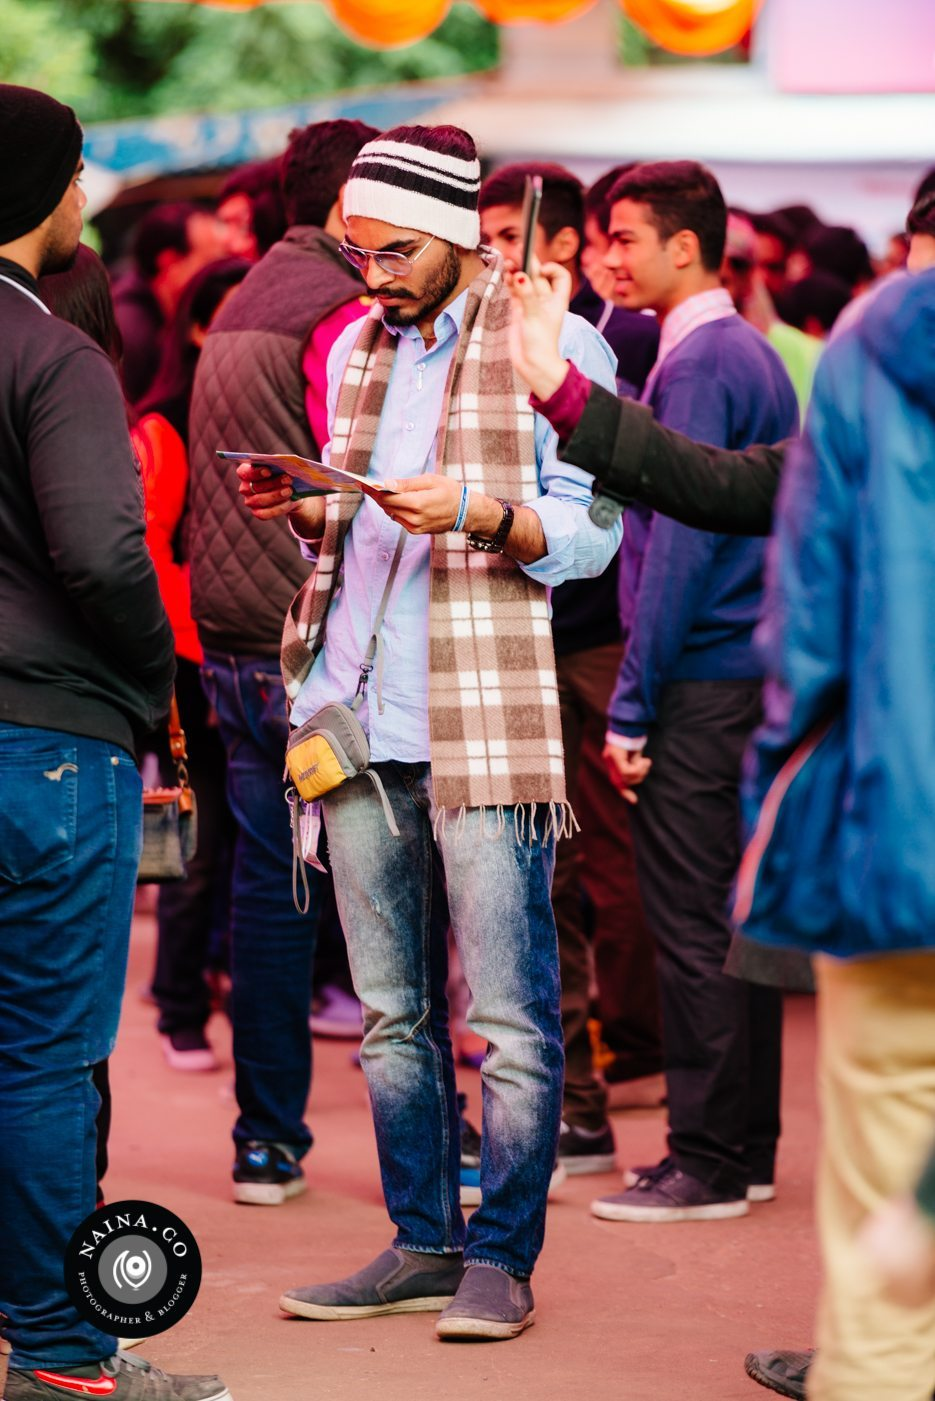 Naina.co-Raconteuse-Visuelle-Photographer-Blogger-Storyteller-Luxury-Lifestyle-January-2015-Jaipur-Literature-Festival-StRegis-LeMeridien-ZeeJLF-EyesForStreetStyle-52